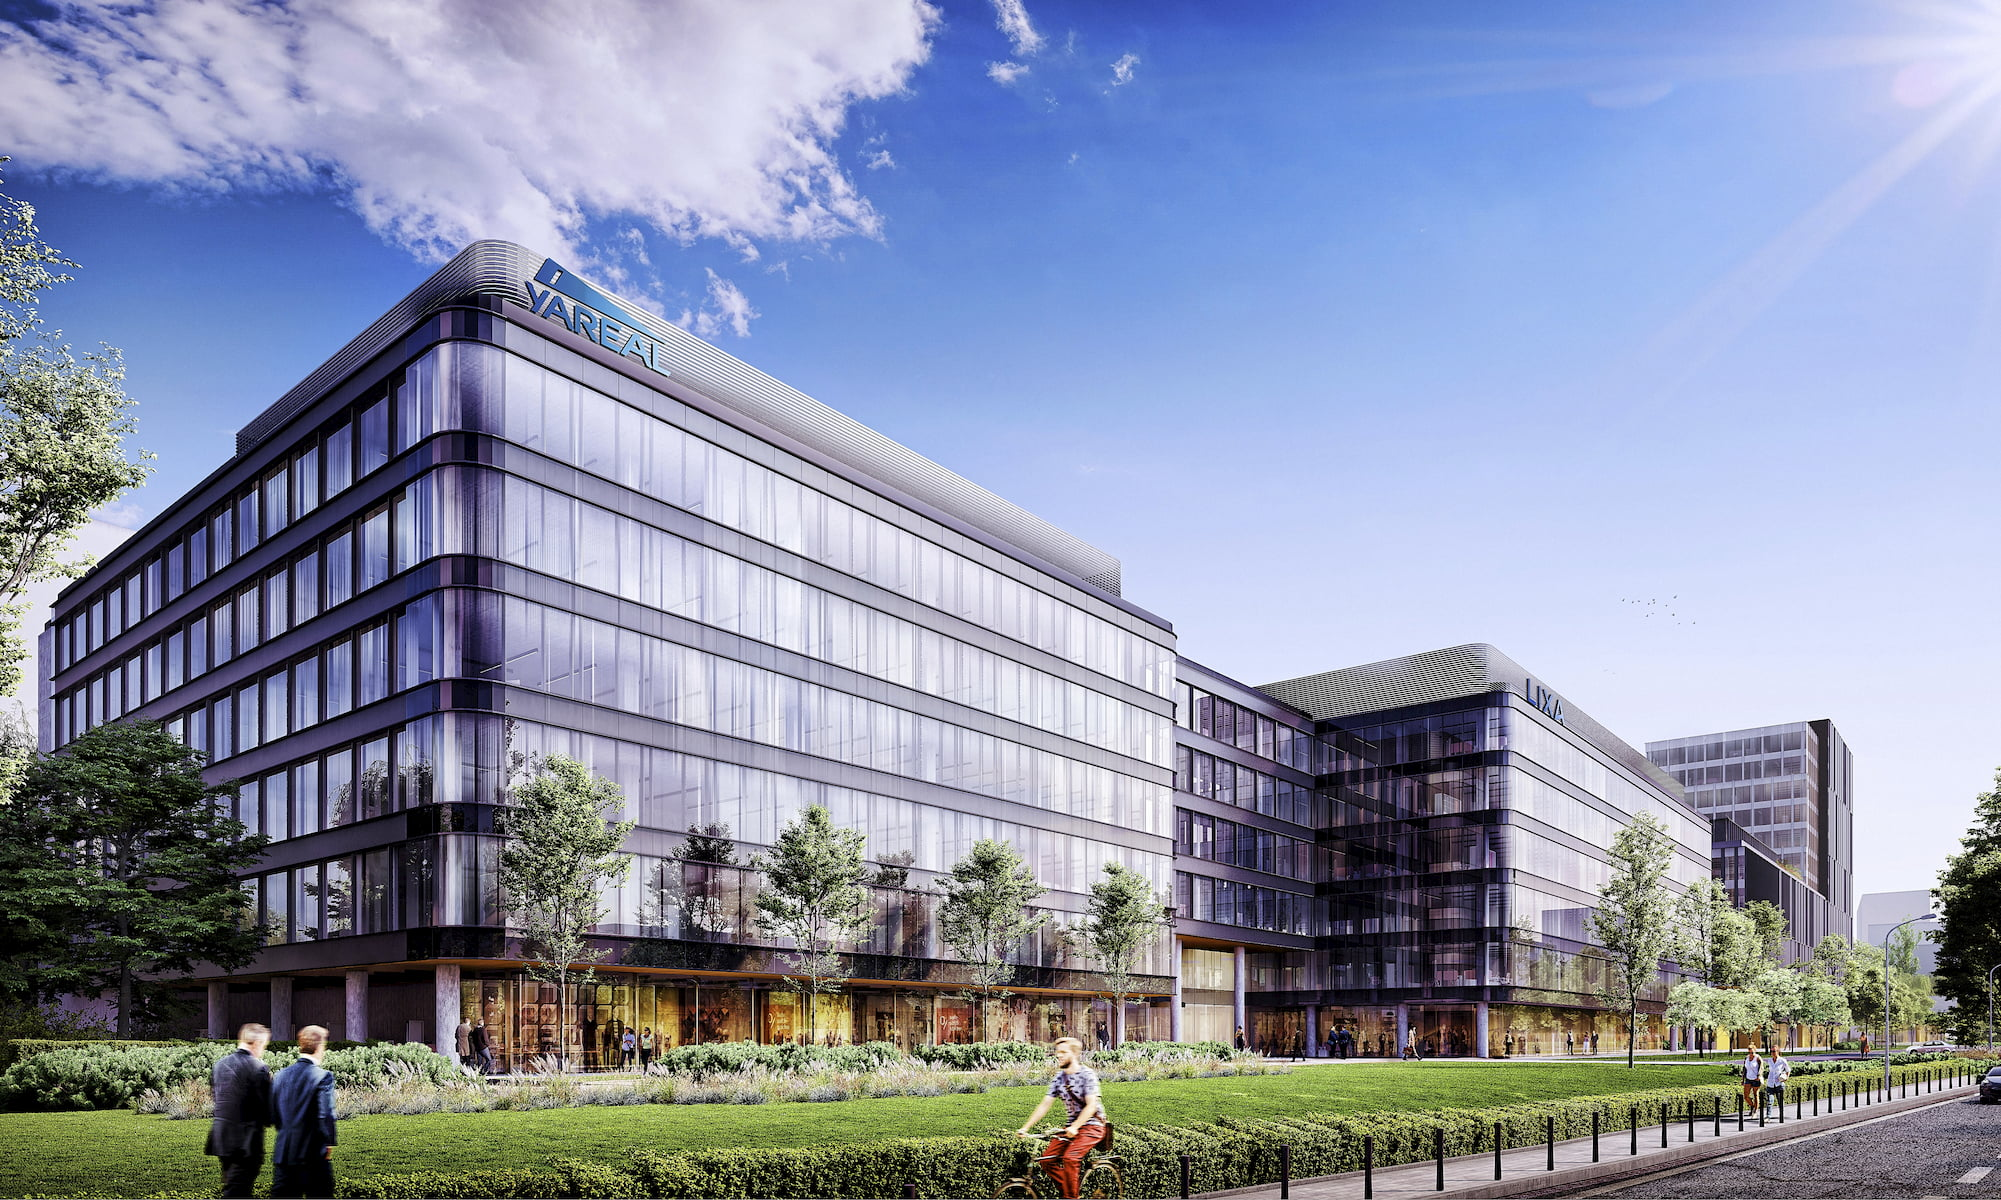 Lixa Office Park Yareal HRA Architekci 2014-2018 street view